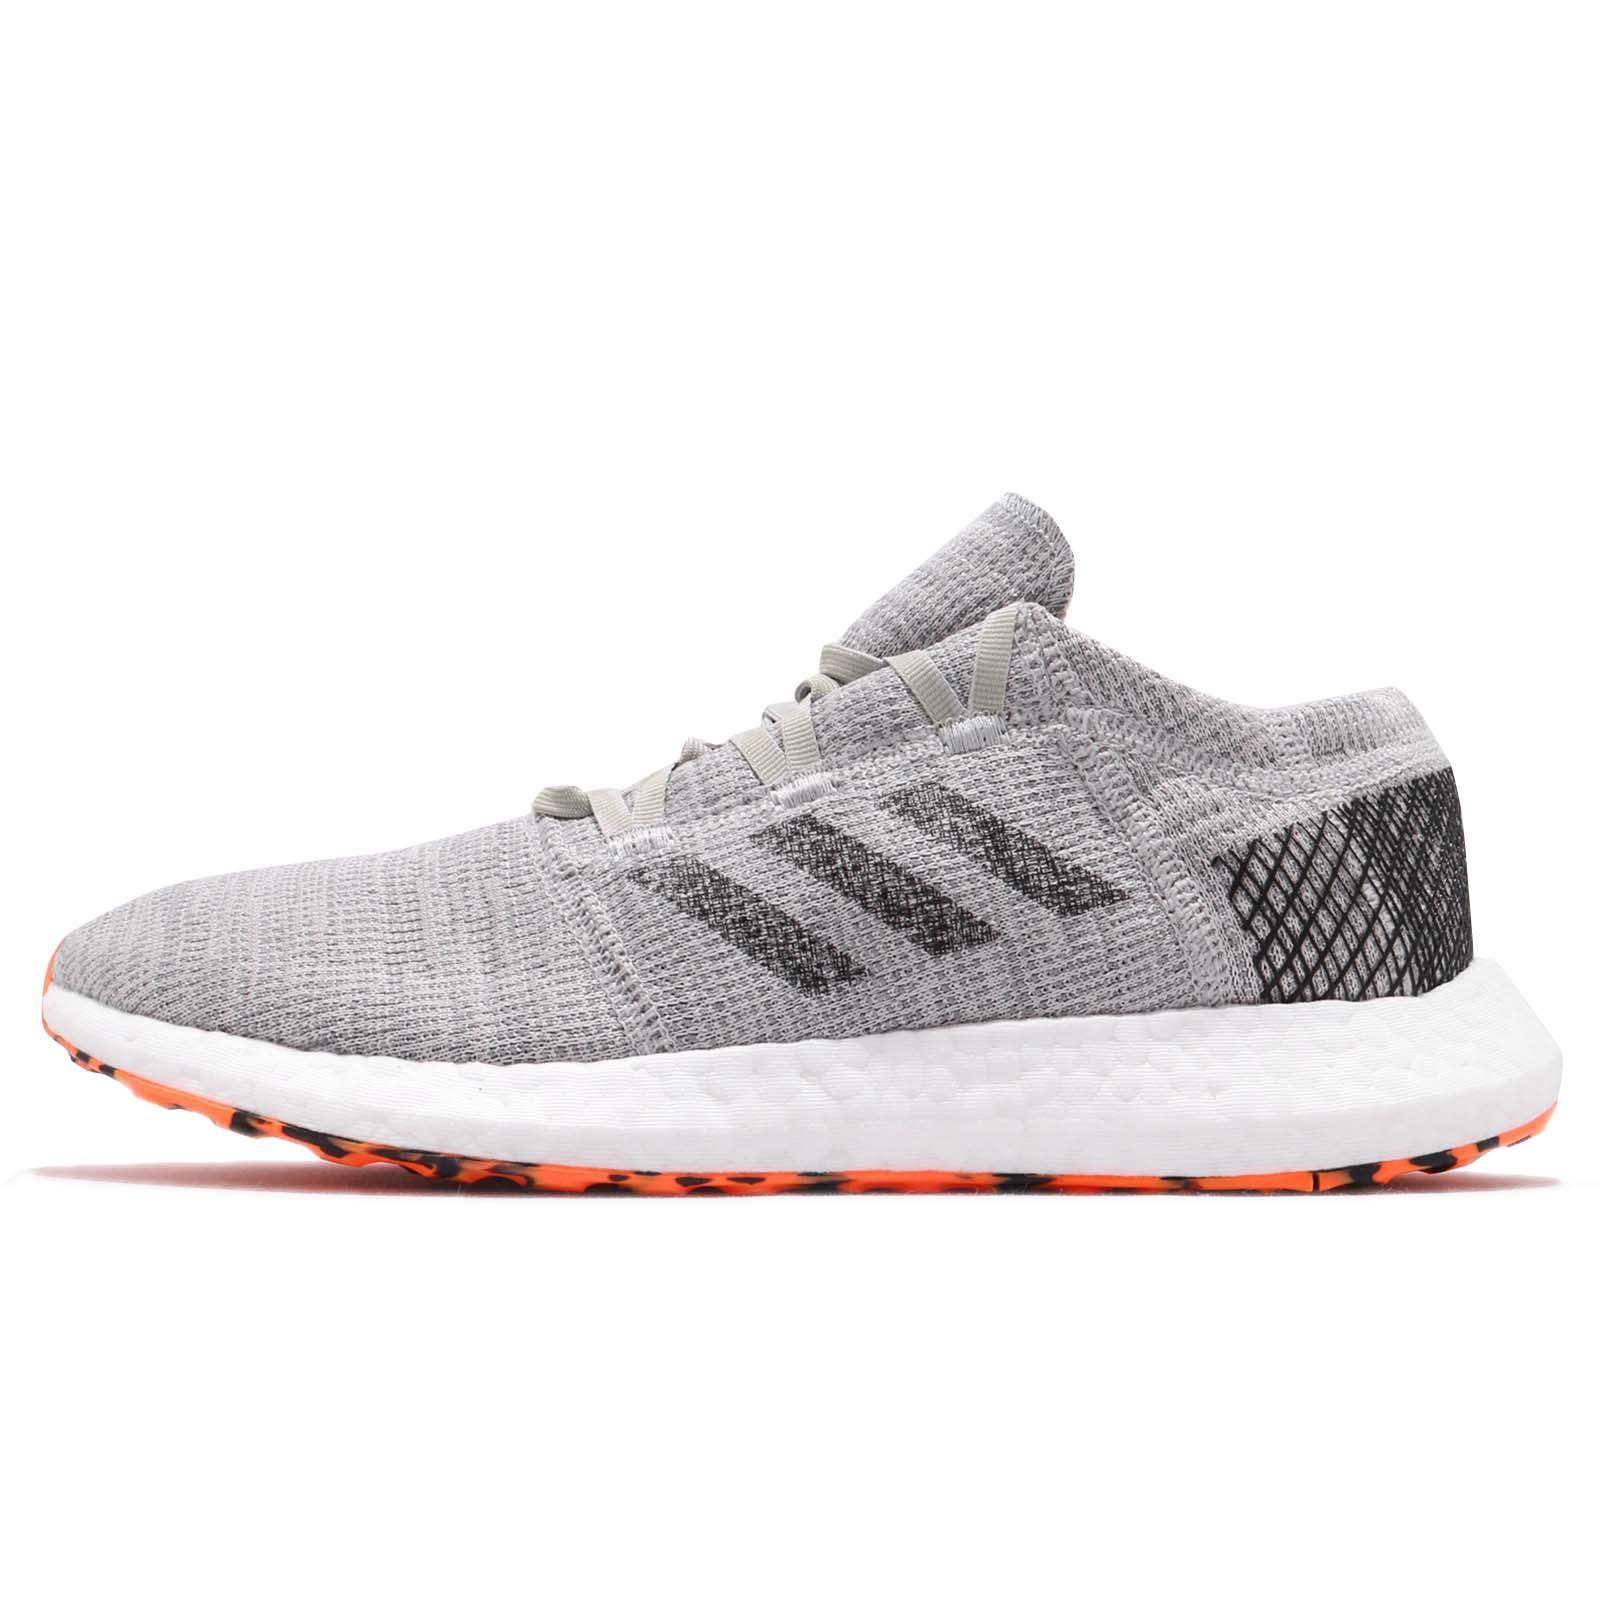 6801eab9dce93 adidas PureBOOST Go Grey Black Hi-Res Orange Men Running Shoes Sneakers  AH2324